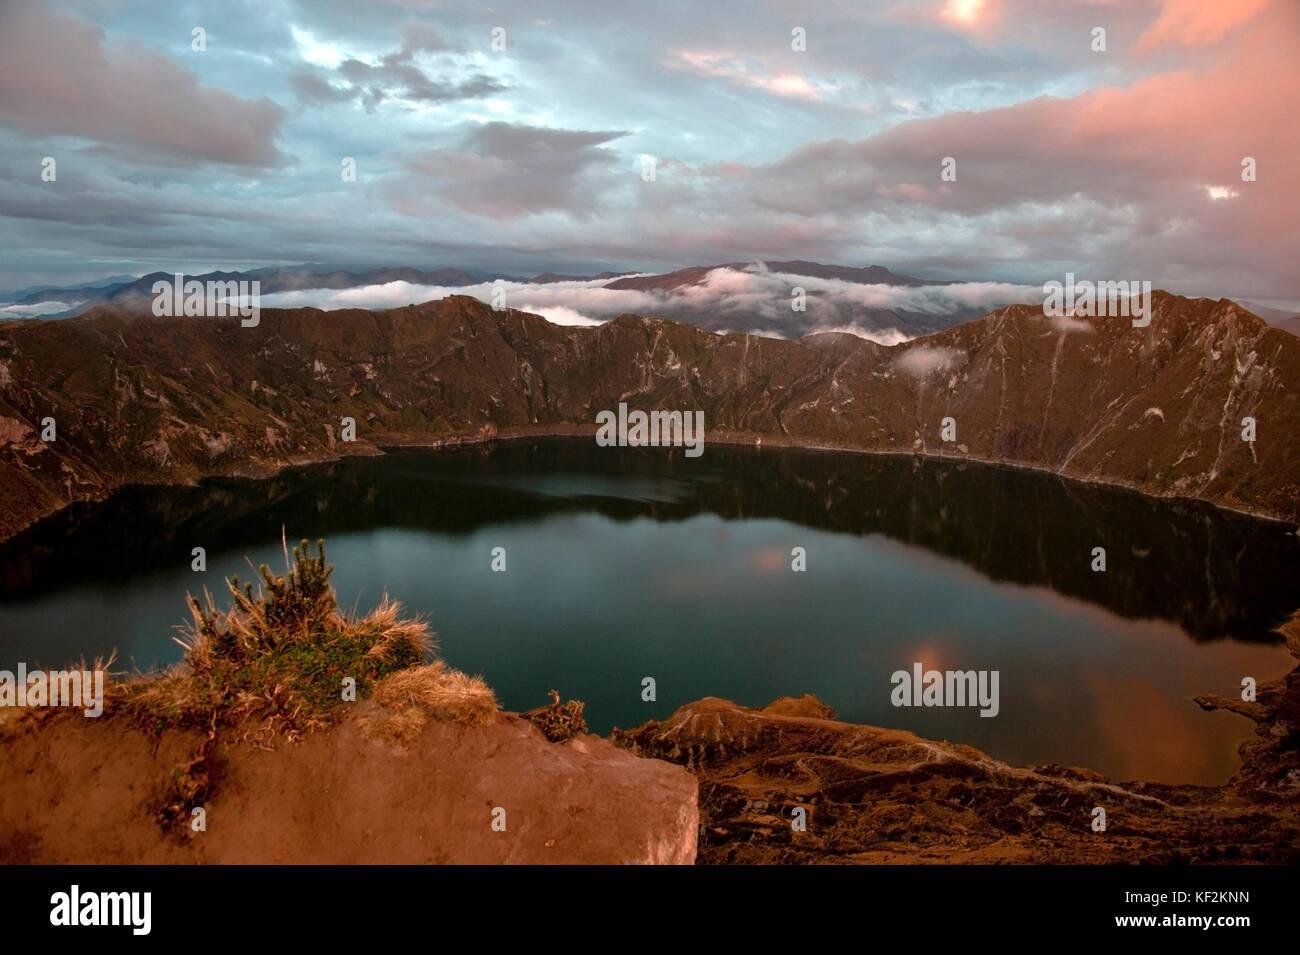 Quilotoa caldera and lake (lagoon), Andes. Ilinizas Nature Reserve, Ecuador - Stock Image